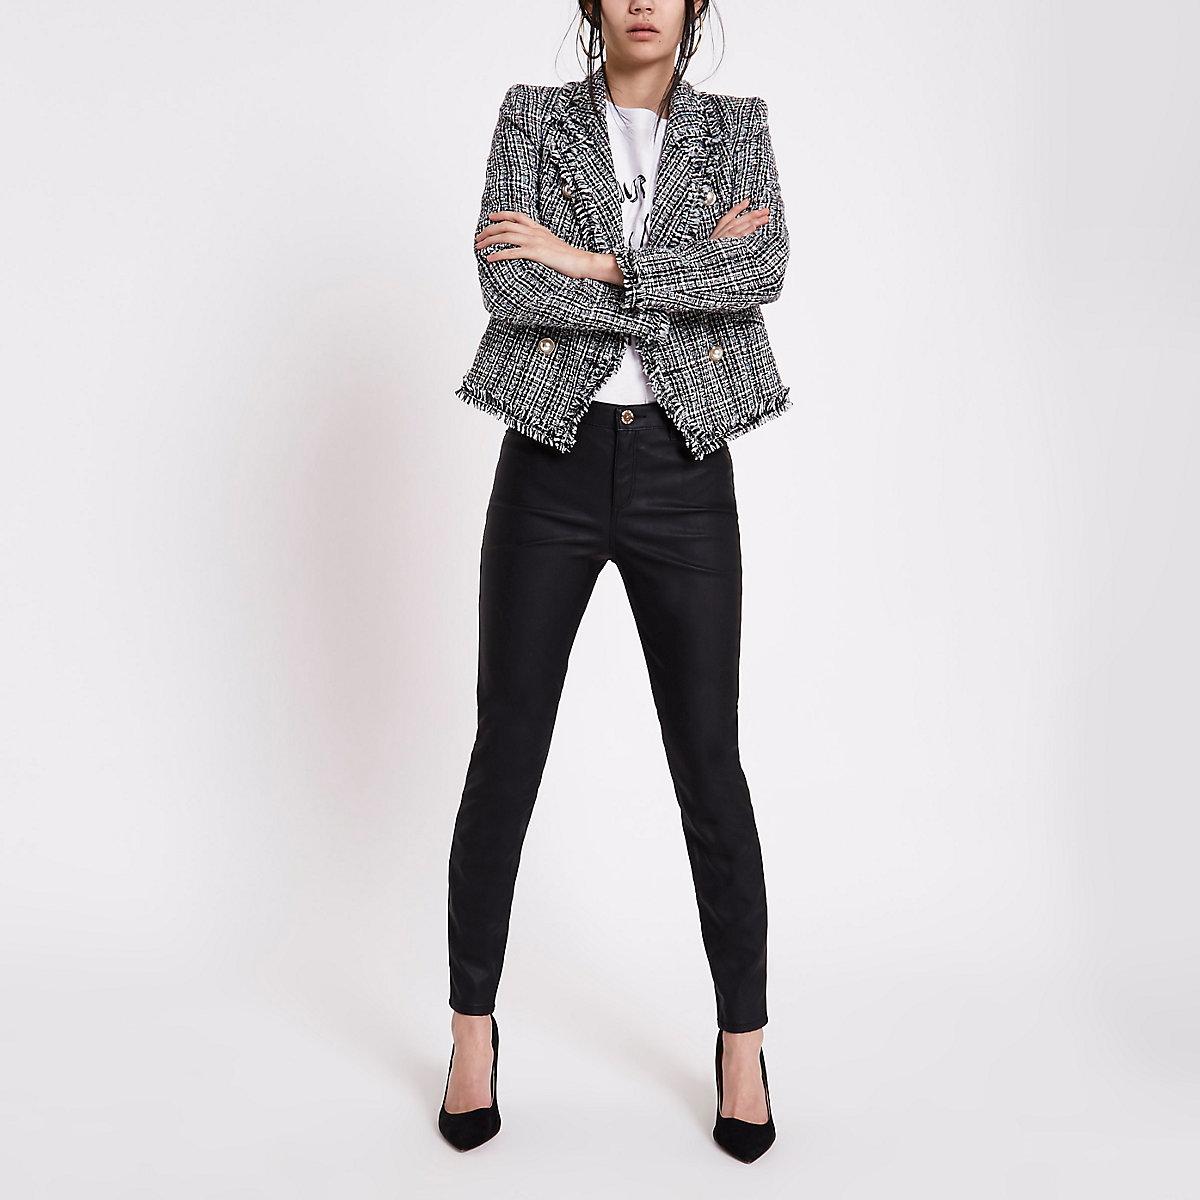 Molly – Schwarze Skinny Fit Hose aus Lederimitat